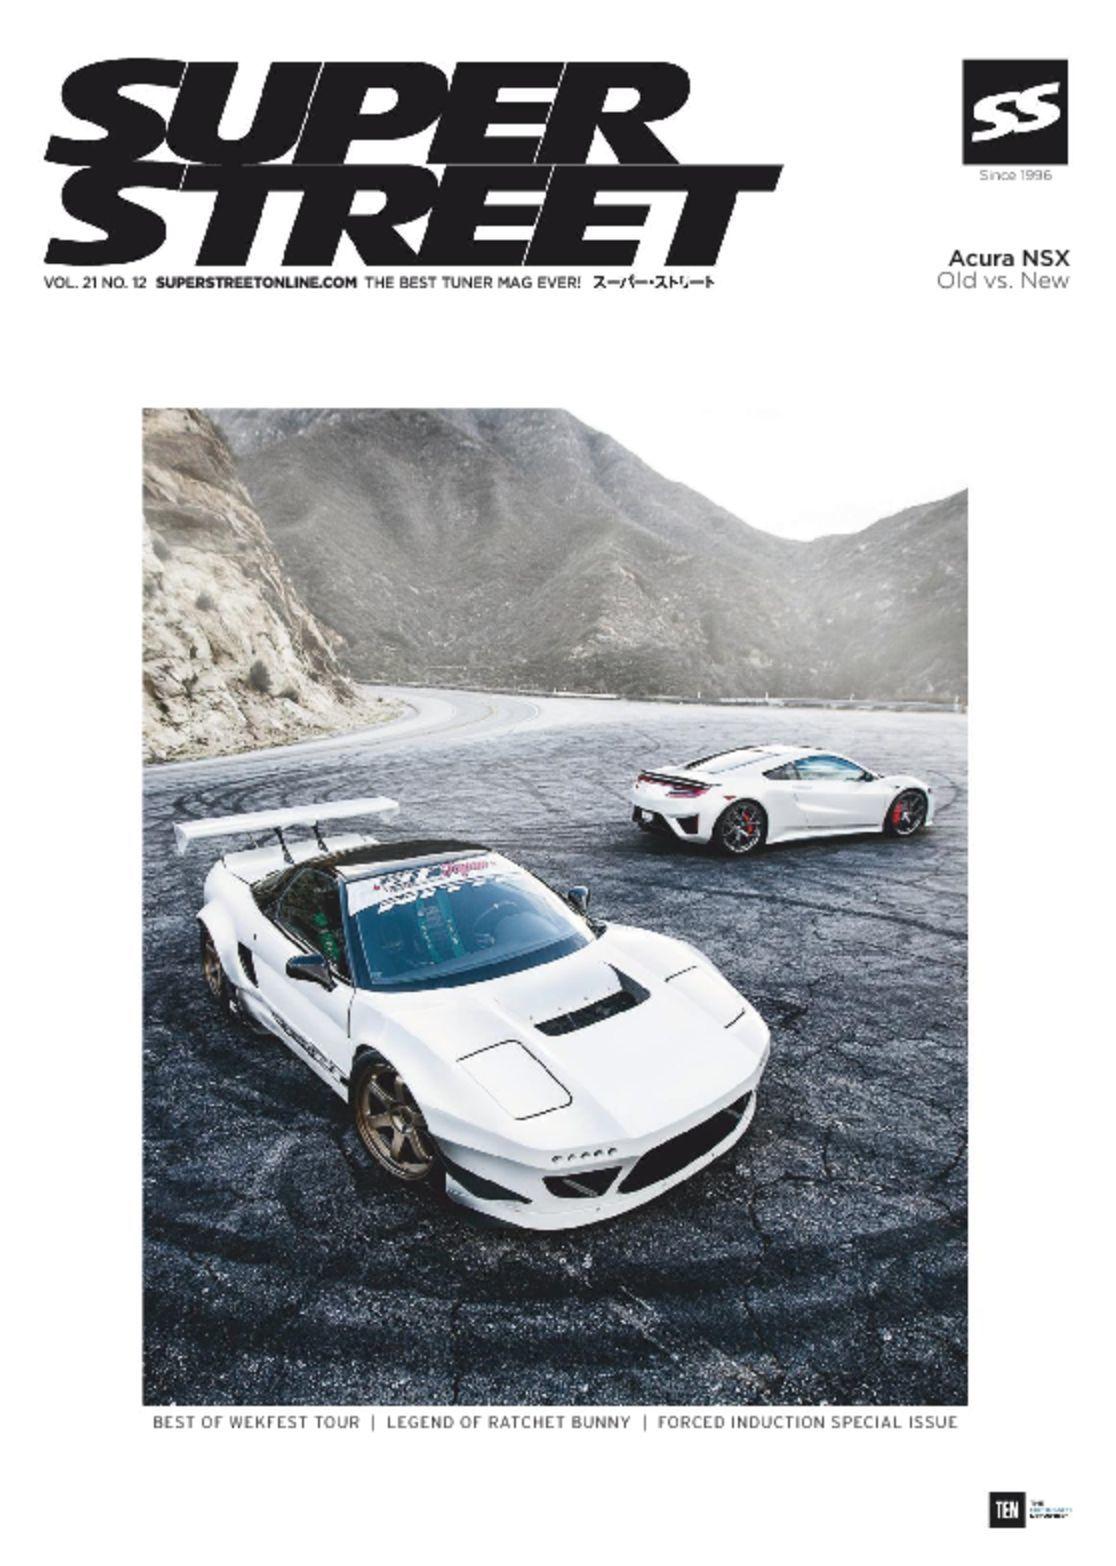 Super Street Magazine Subscription